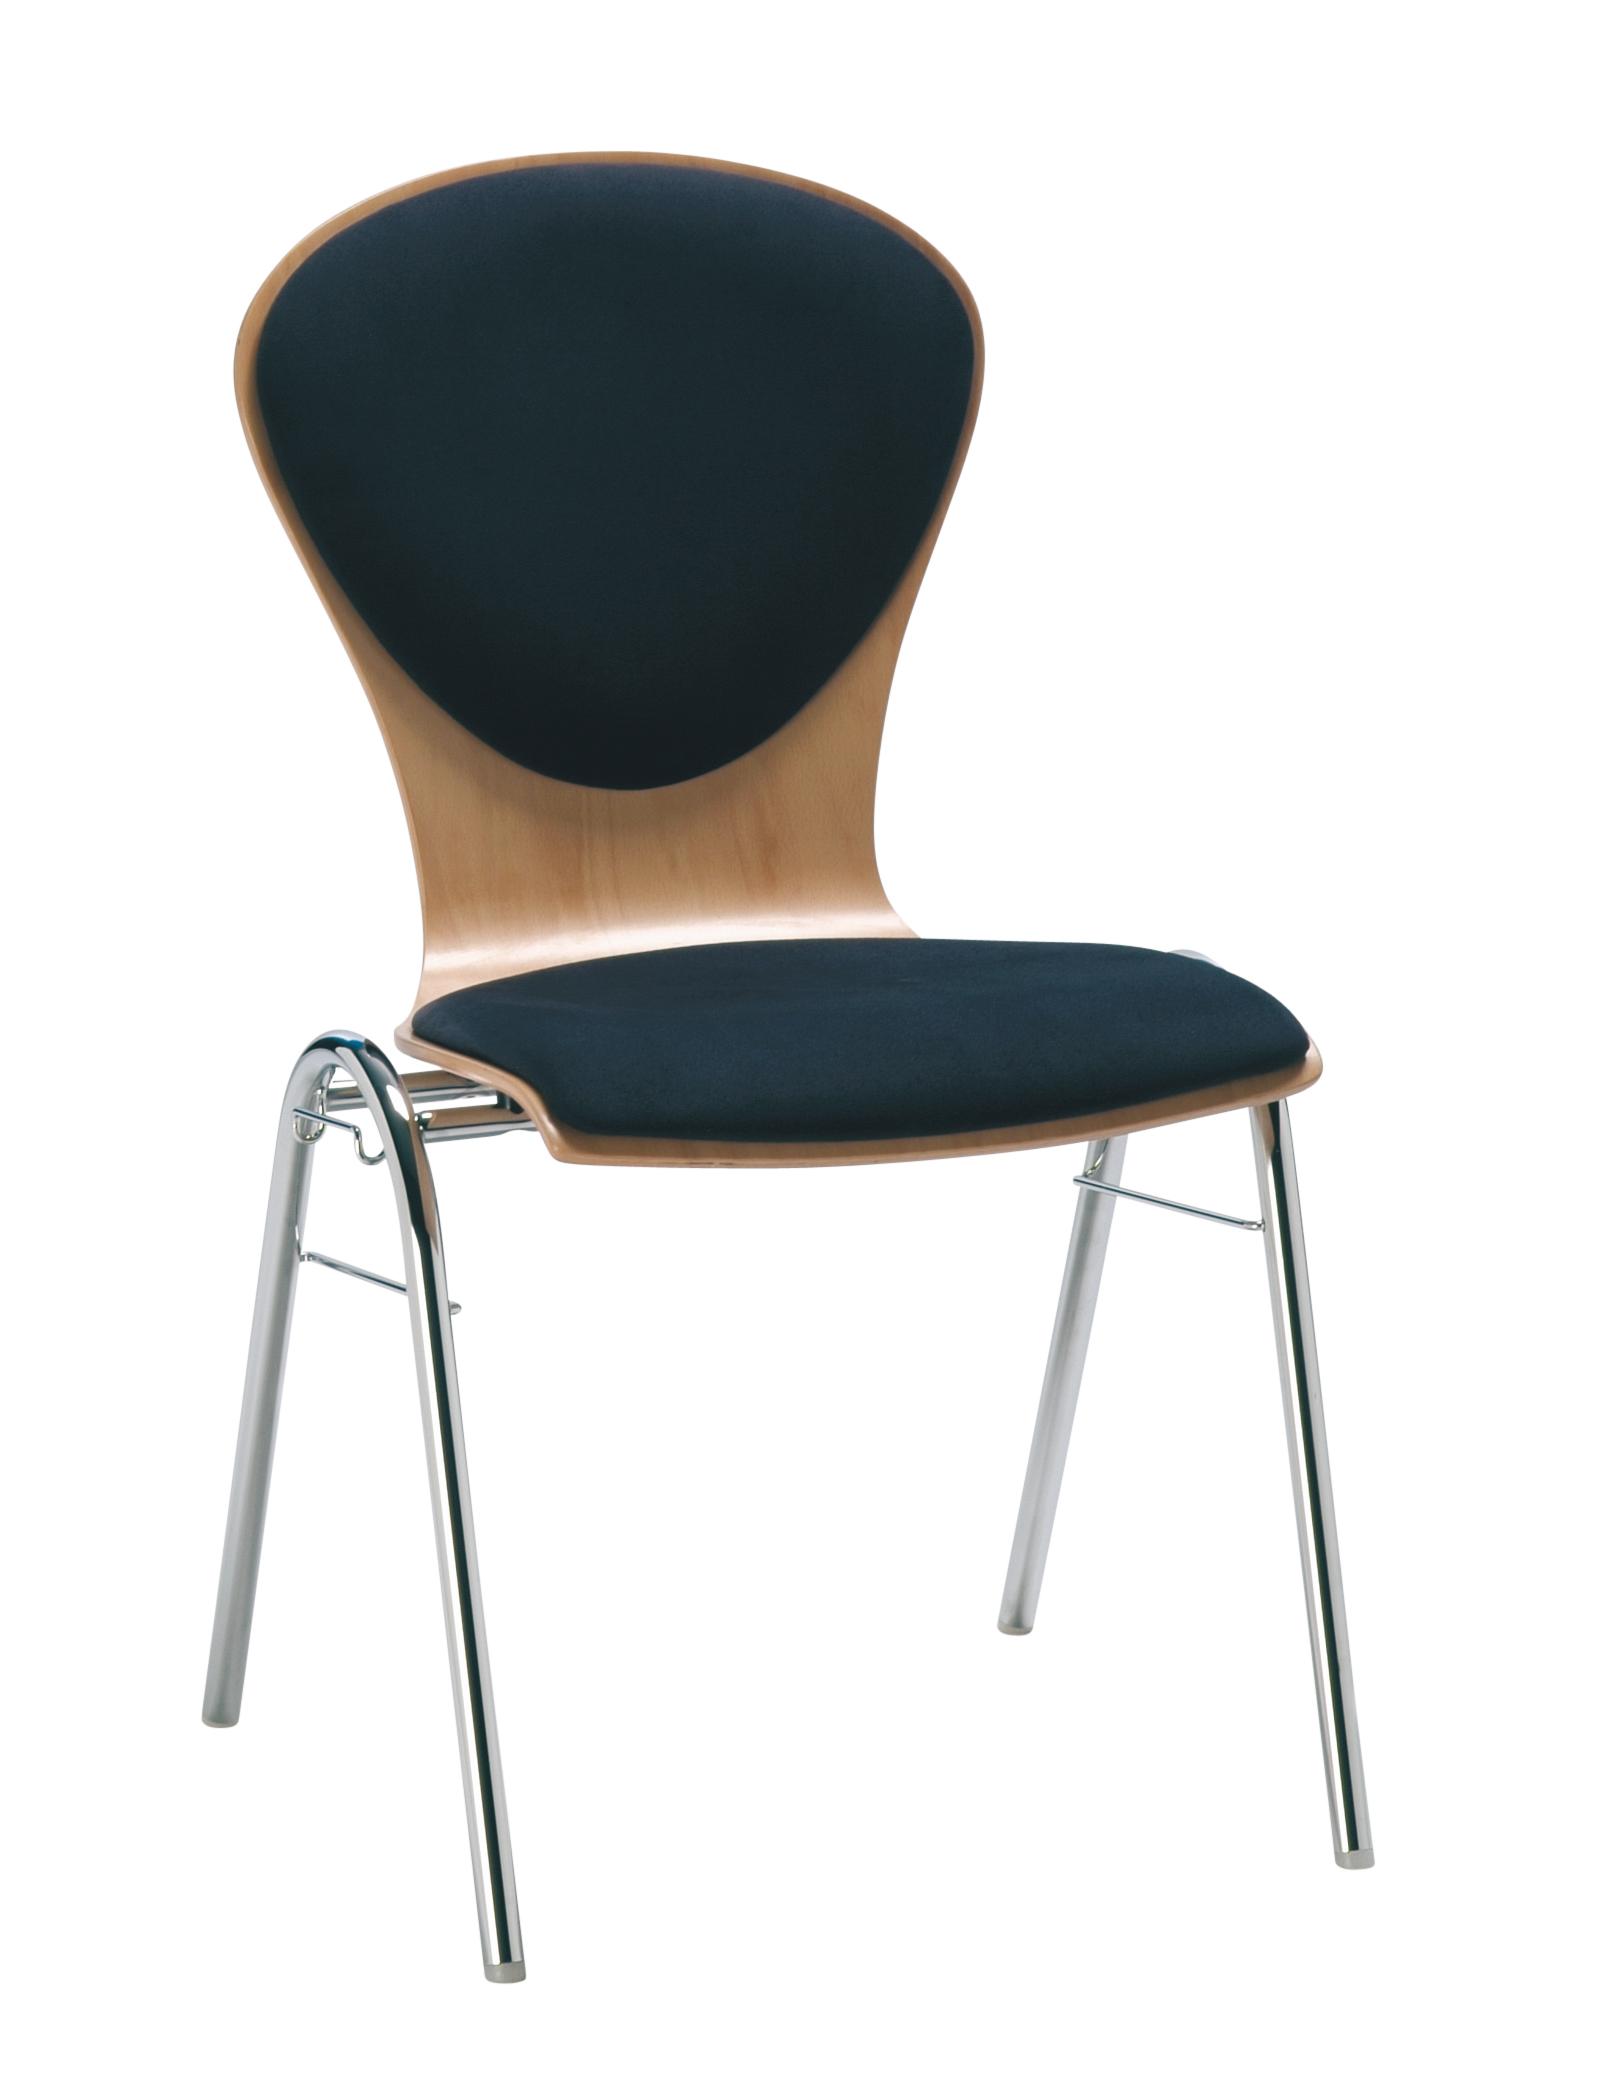 ATLANTA Stapelstuhl (Hiller, Stapelstühle, Buche / Buchenholz) - bis 20 Stühle stapelbar!